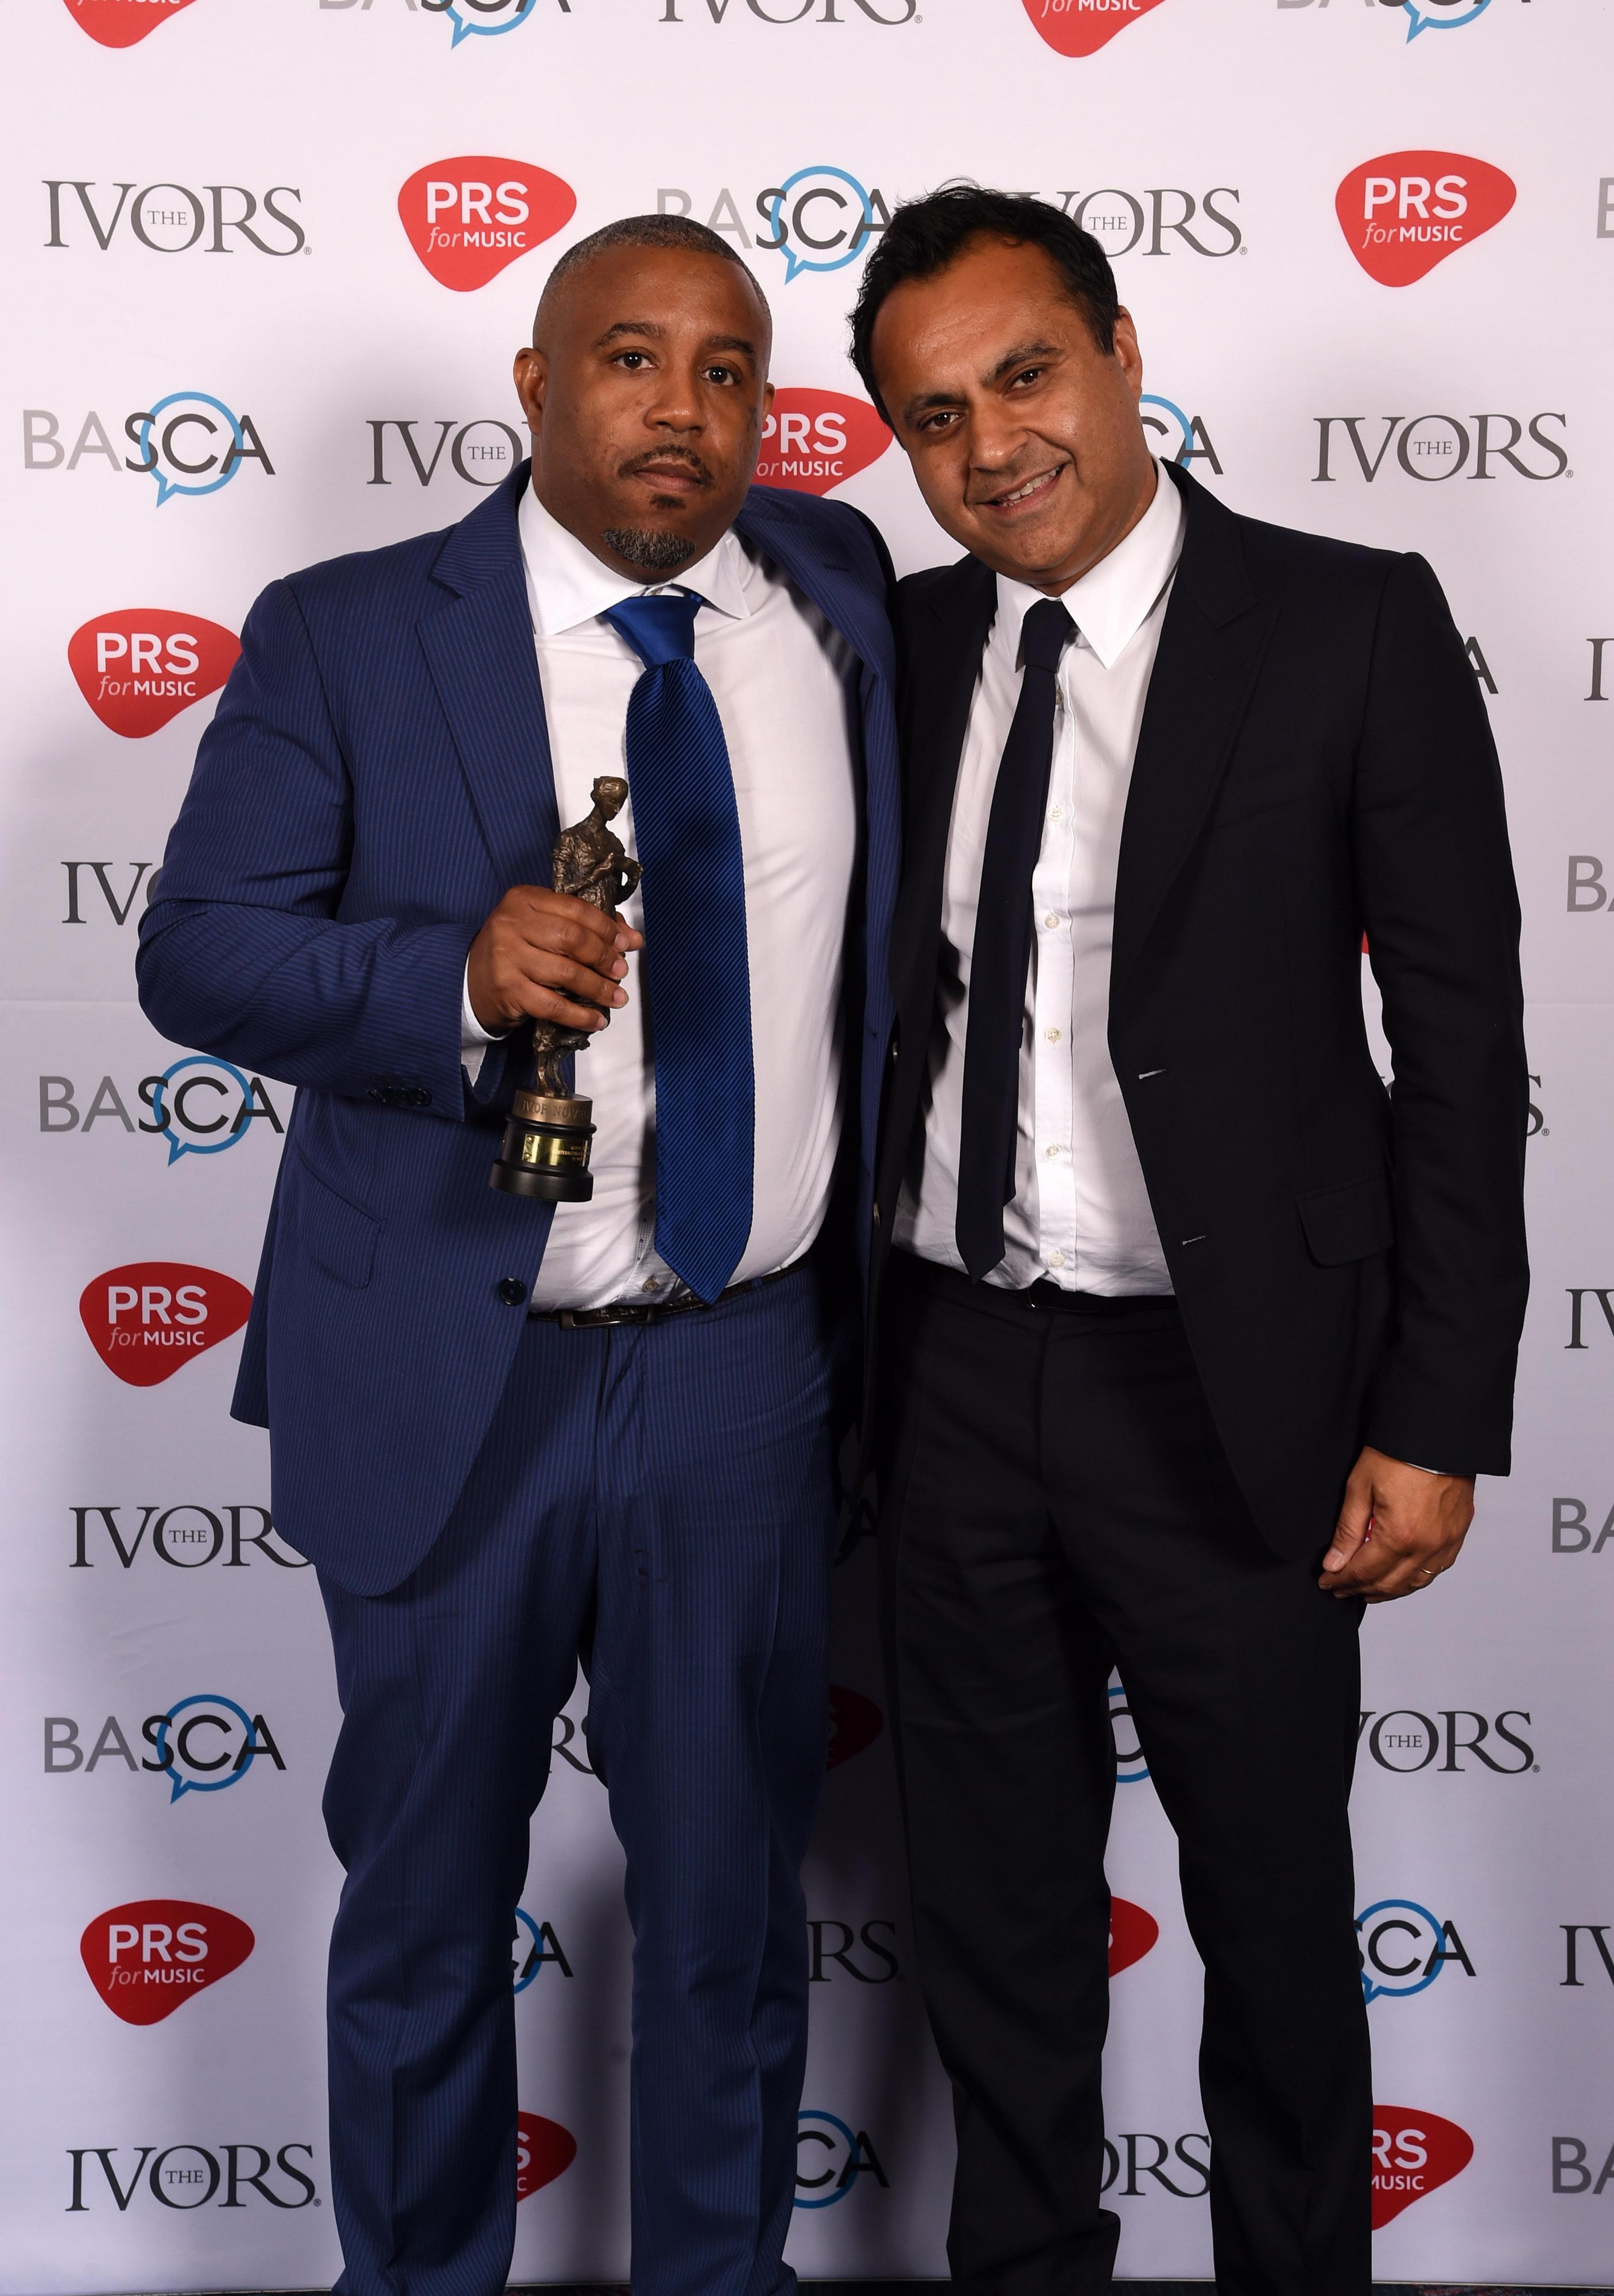 International Achievement - Wayne Hector and presenter Sonny Takhar - The Ivors 2016 photo Mark Allen